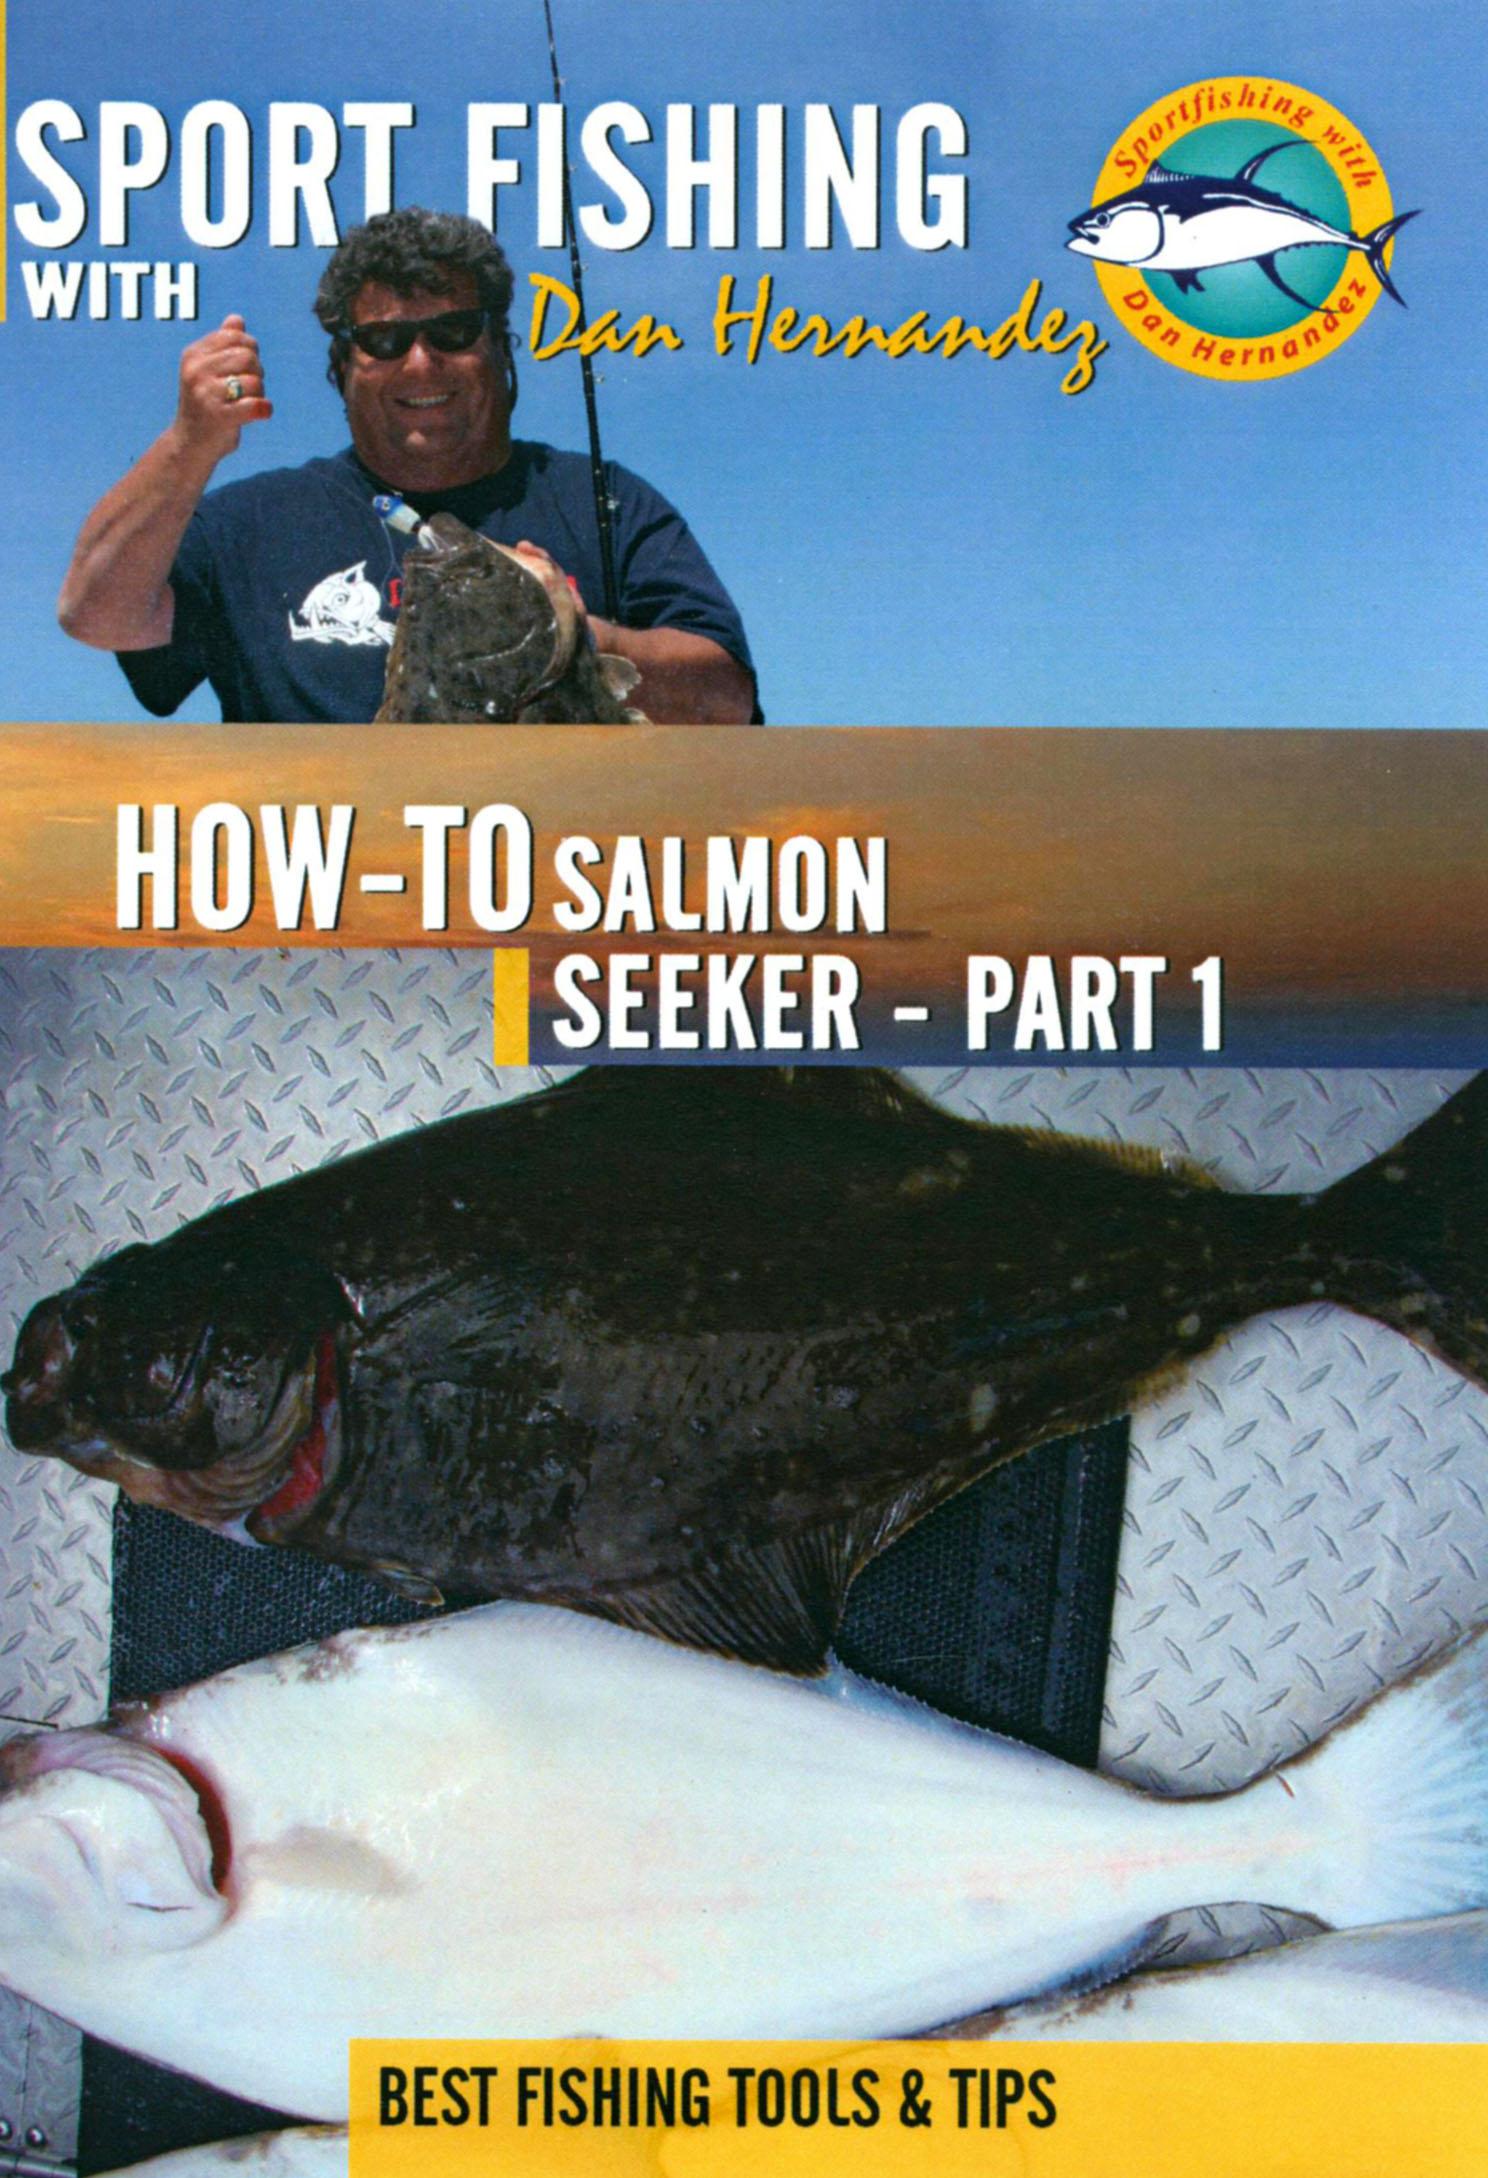 Sport Fishing With Dan Hernandez: How-To Seeker, Part 1